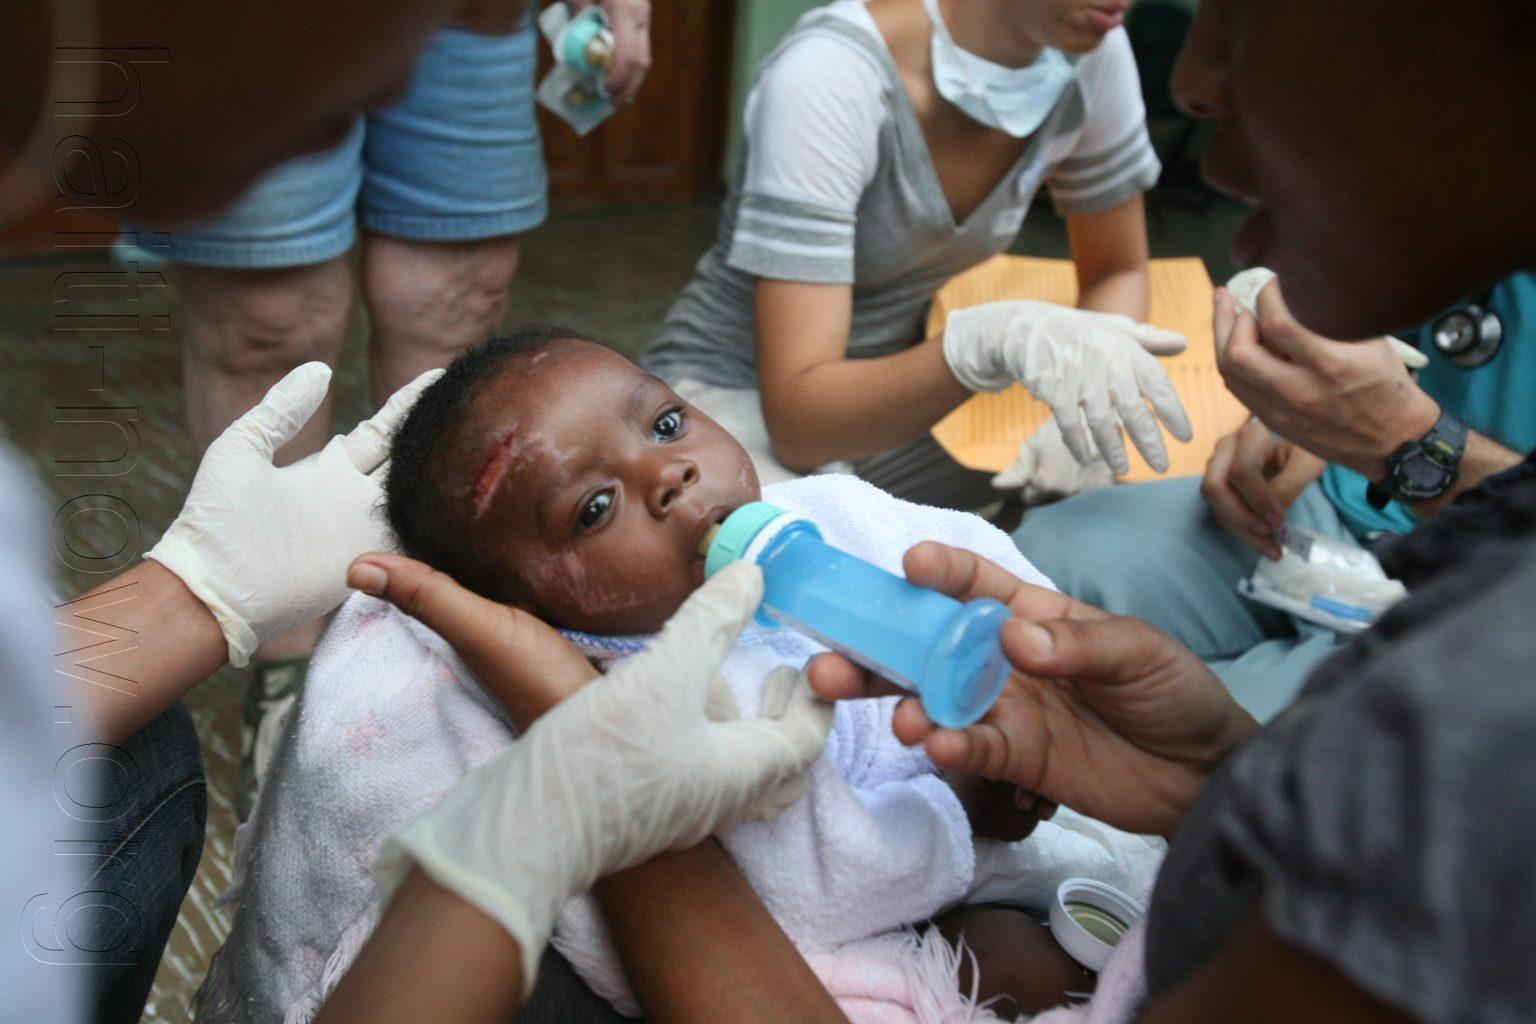 Impacts of Devastating 2010 Earthquake on Restavek Children - Haiti Now